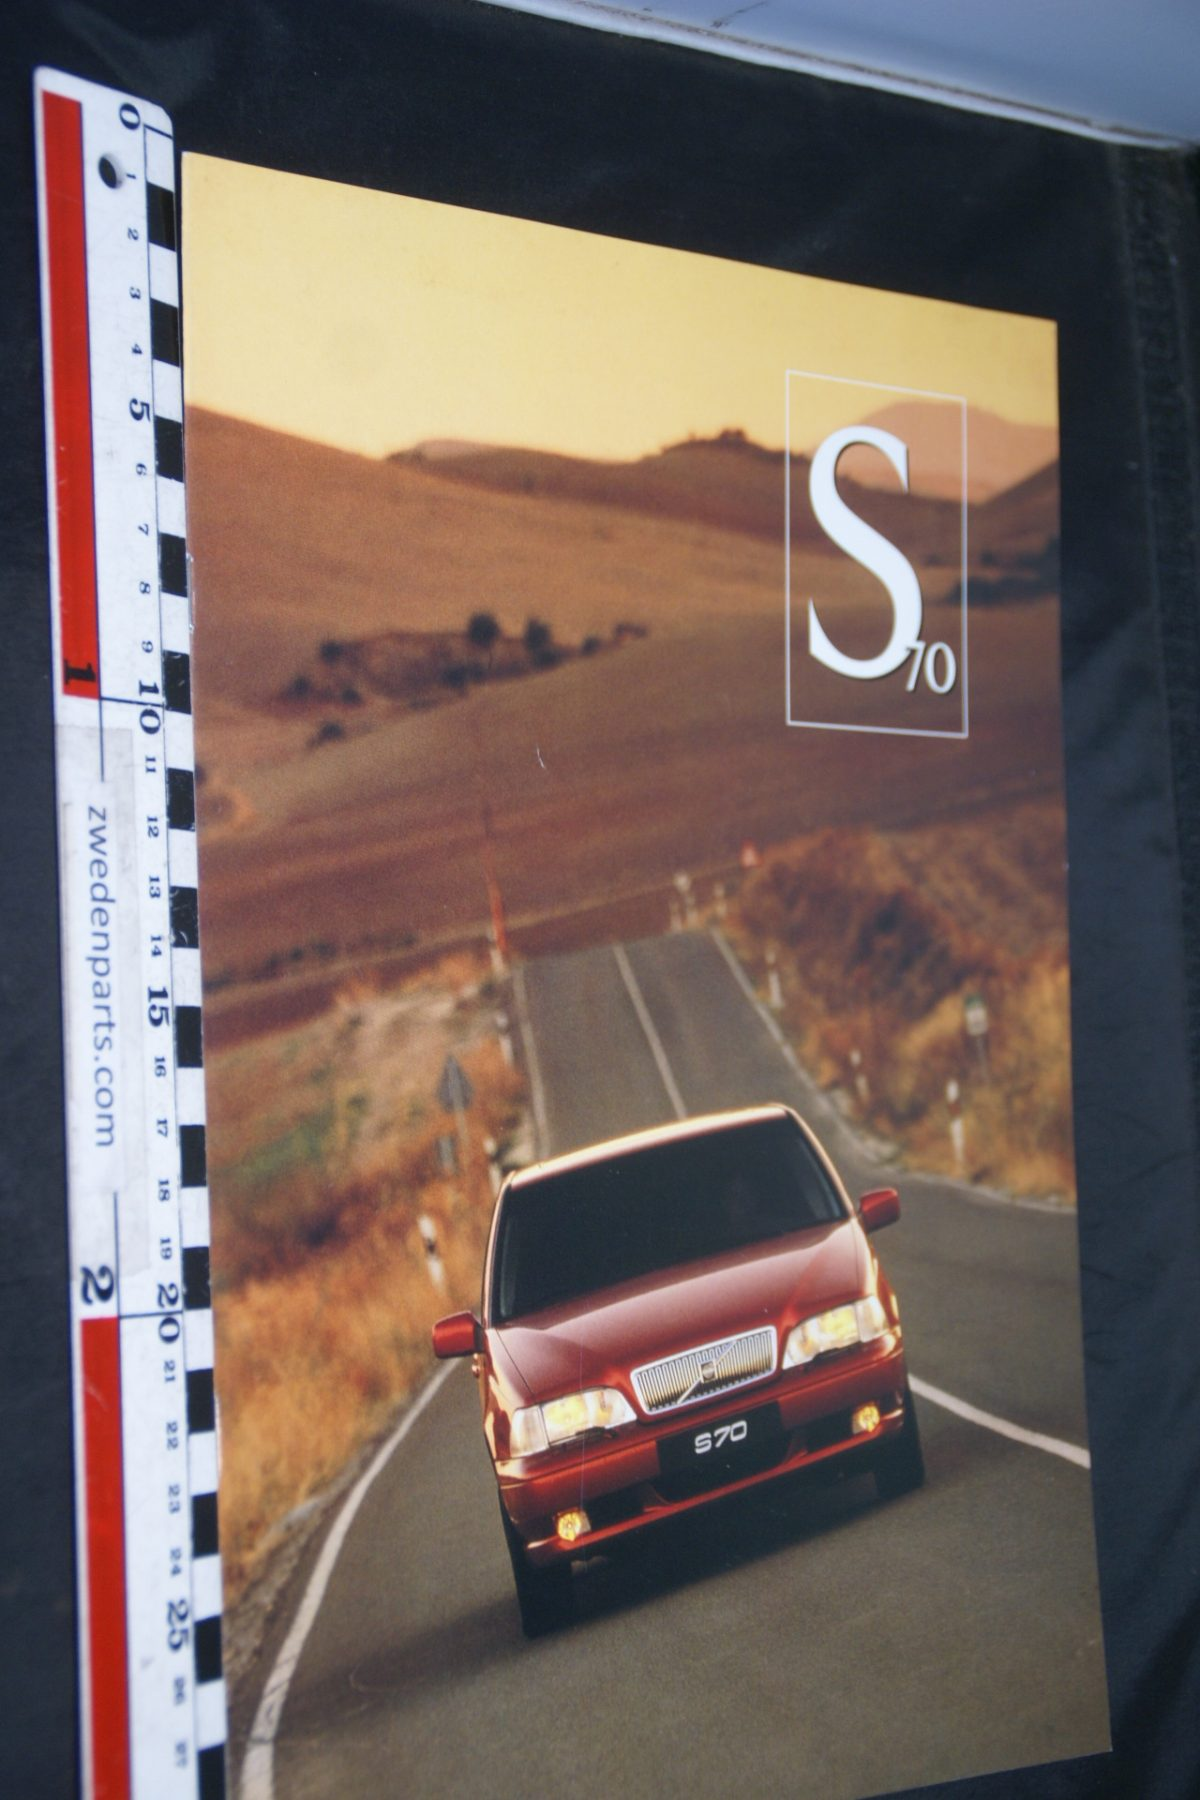 DSC06334 1996 brochure Volvo S70 nr 9612S70-1